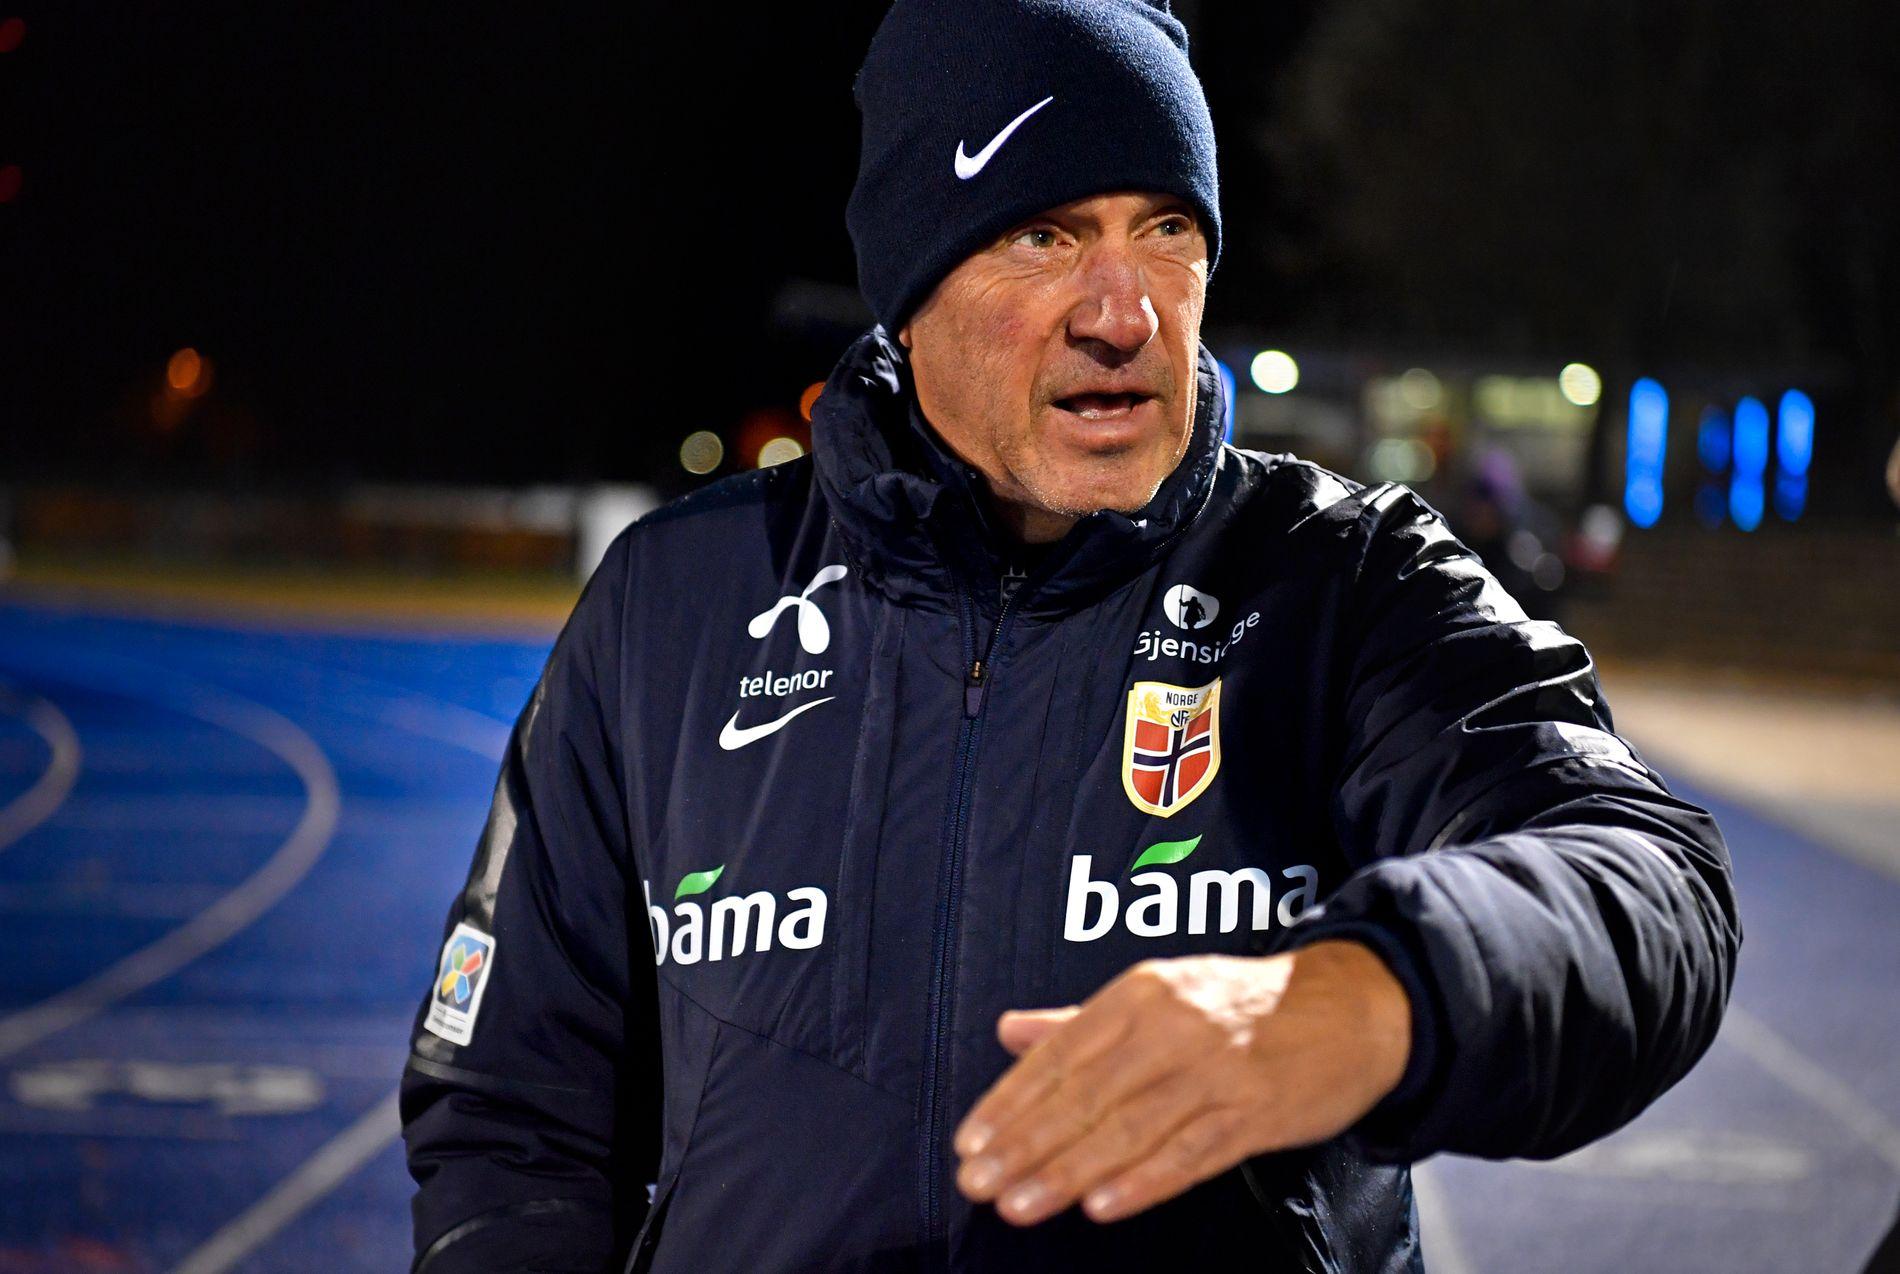 PÅ TOMTEJAKT: Nils Johan Semb bekrefter at NFF leter etter mulige områder i Oslo hvor A-landslaget kan få sin egen treningsbane.